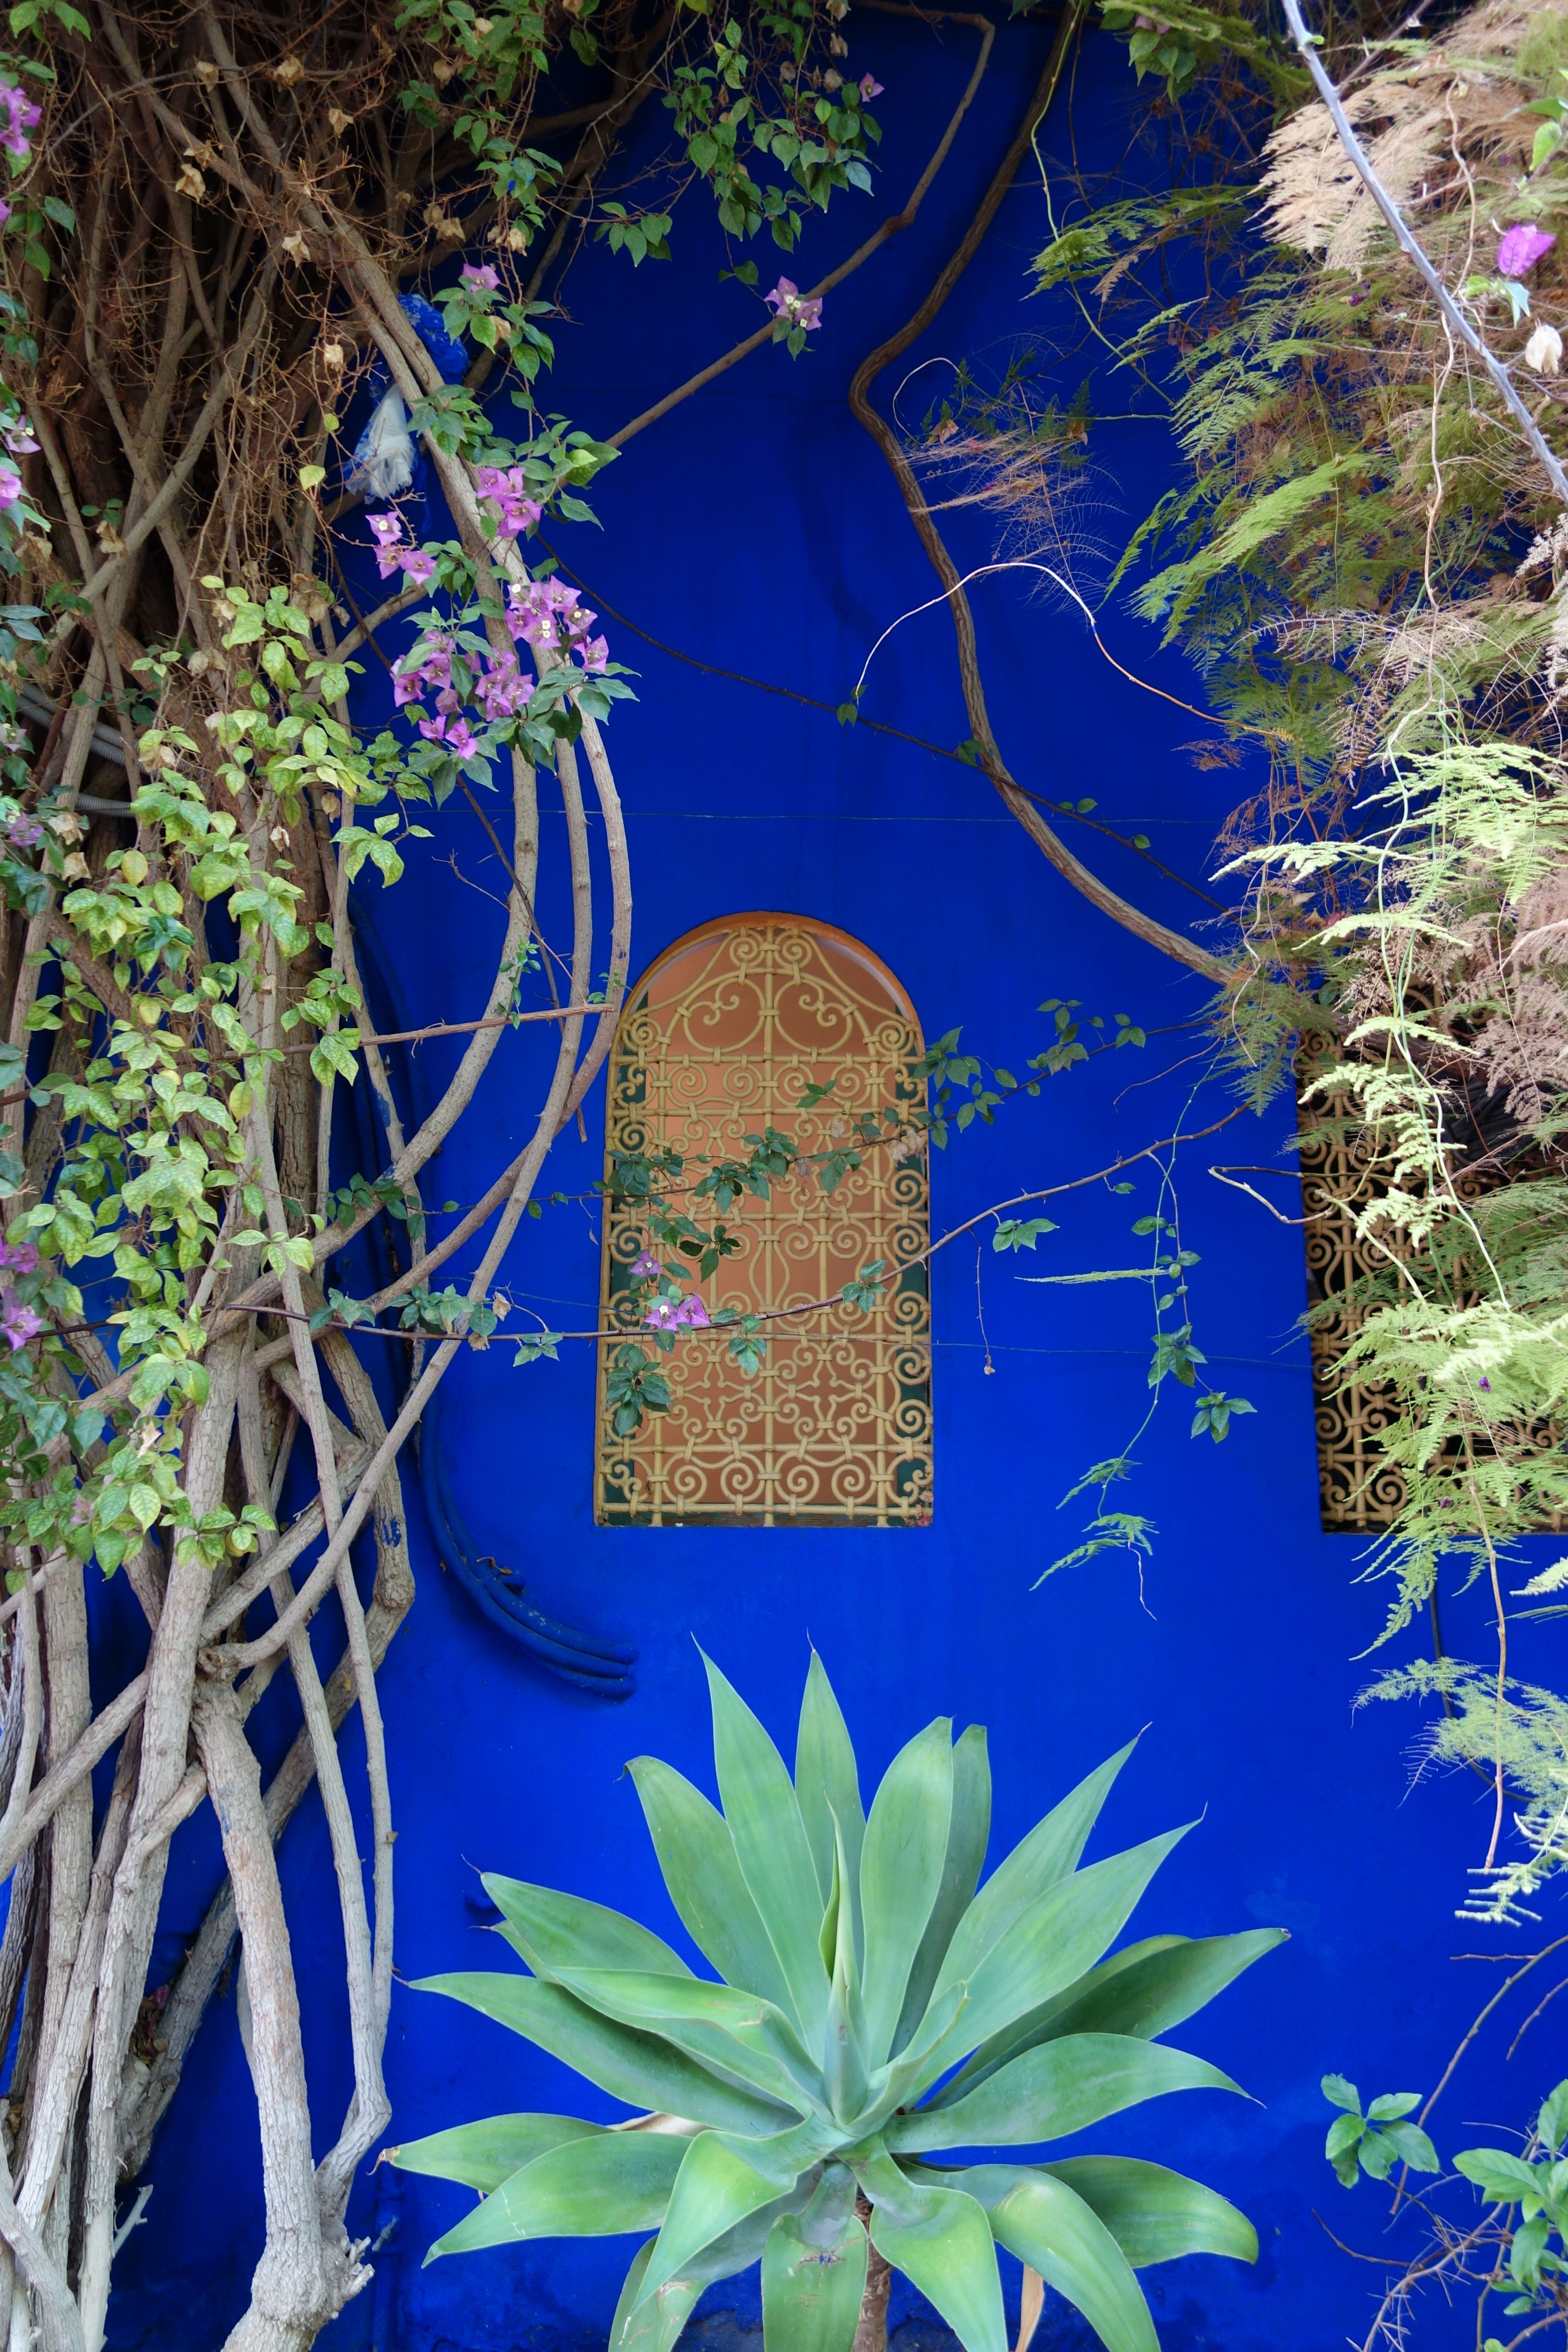 Jardin Majorelle YSL Marrakech photo: psreadme.com